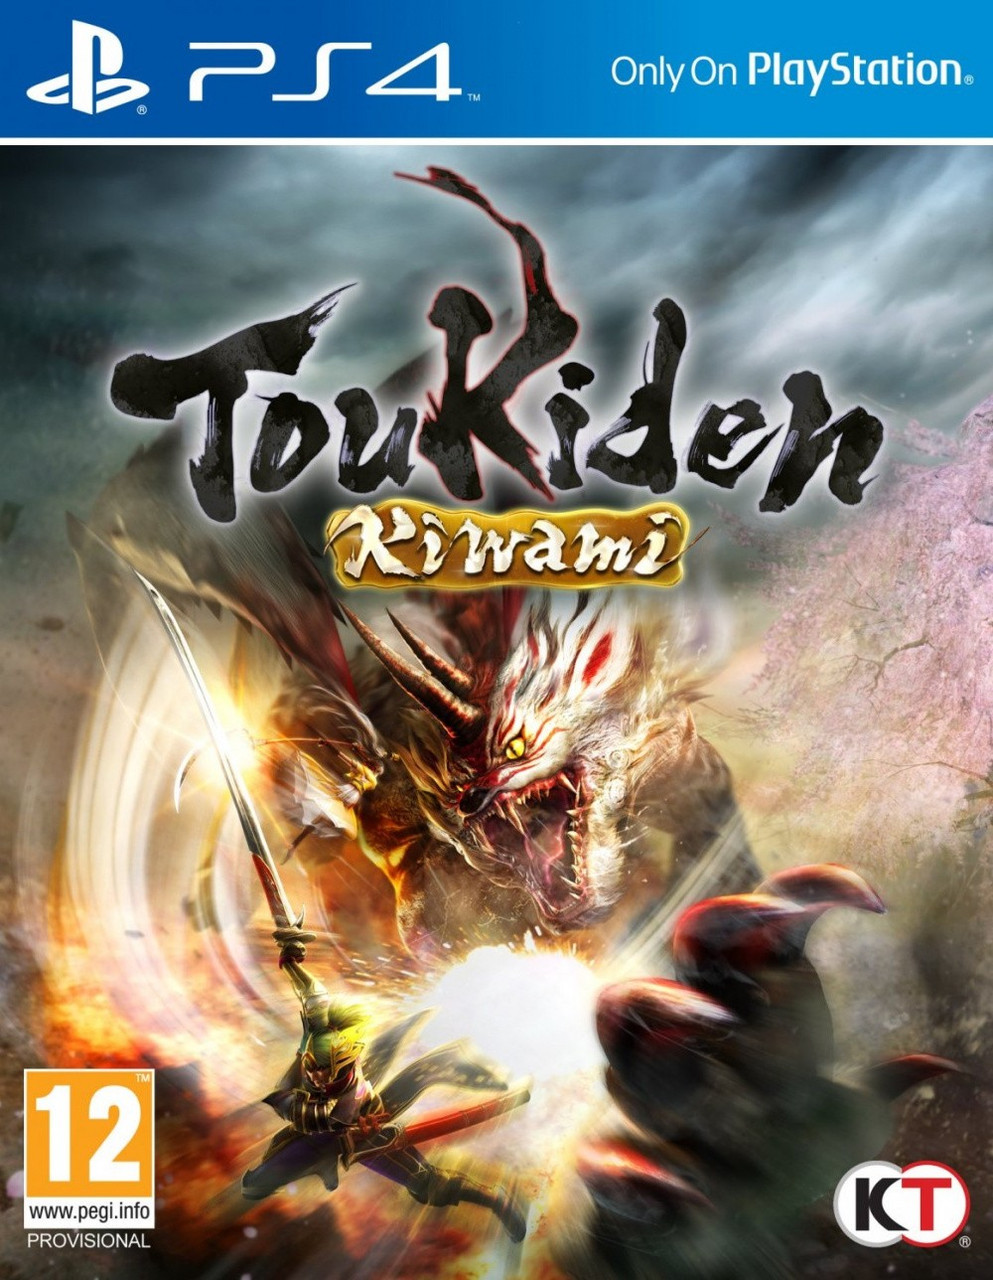 Toukiden Kiwami (английская версия) PS4